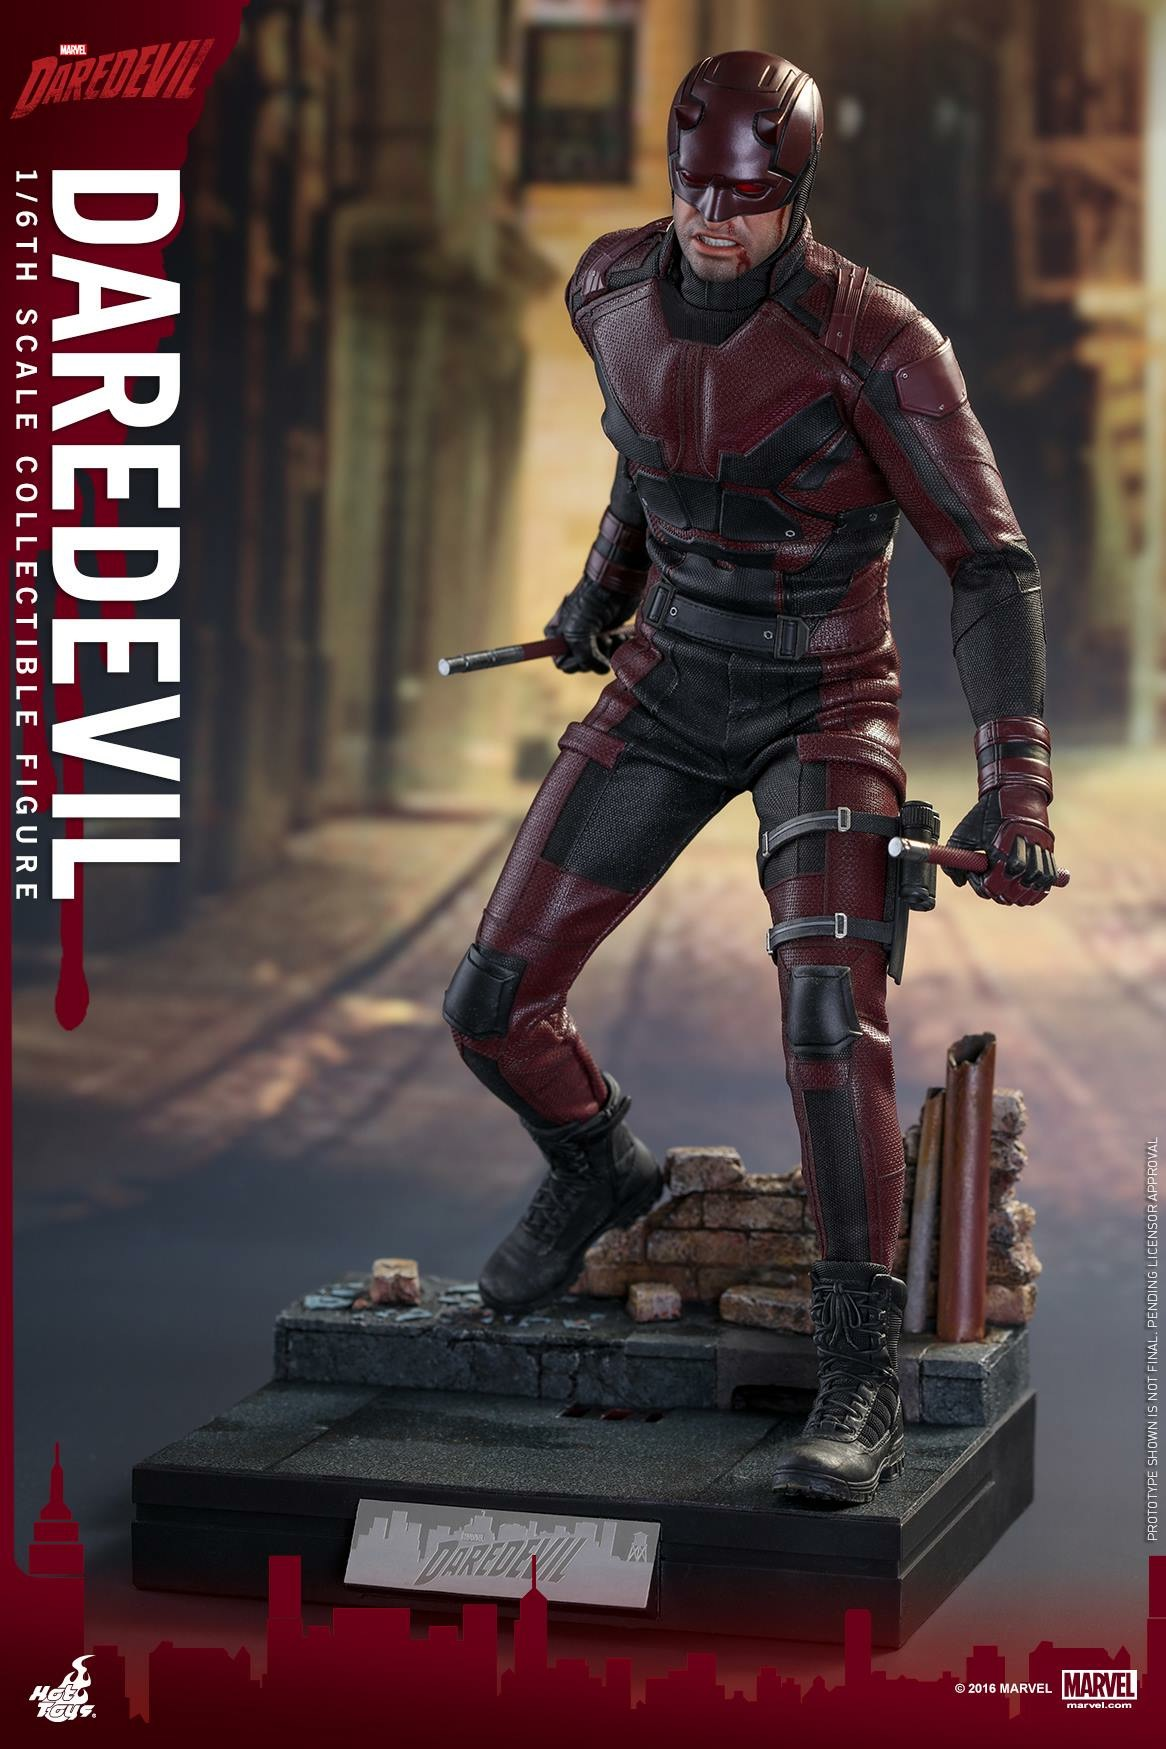 Hot Toys Netflix Daredevil Promo Pics Revealed Pre Order Info